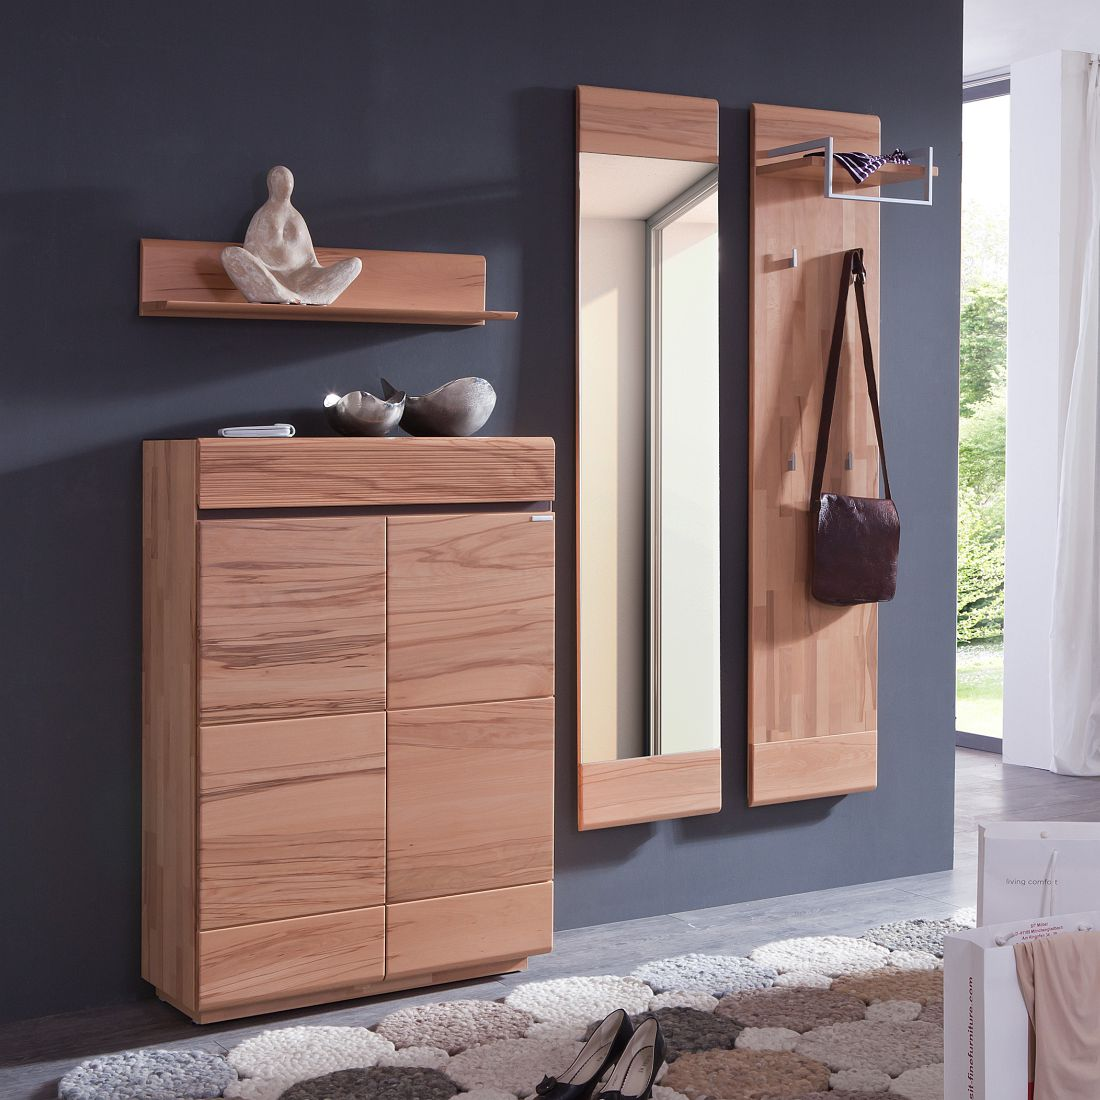 garderobe cosimo ii 4 teilig kernbuche massiv terrabraun jung s hne g nstig. Black Bedroom Furniture Sets. Home Design Ideas